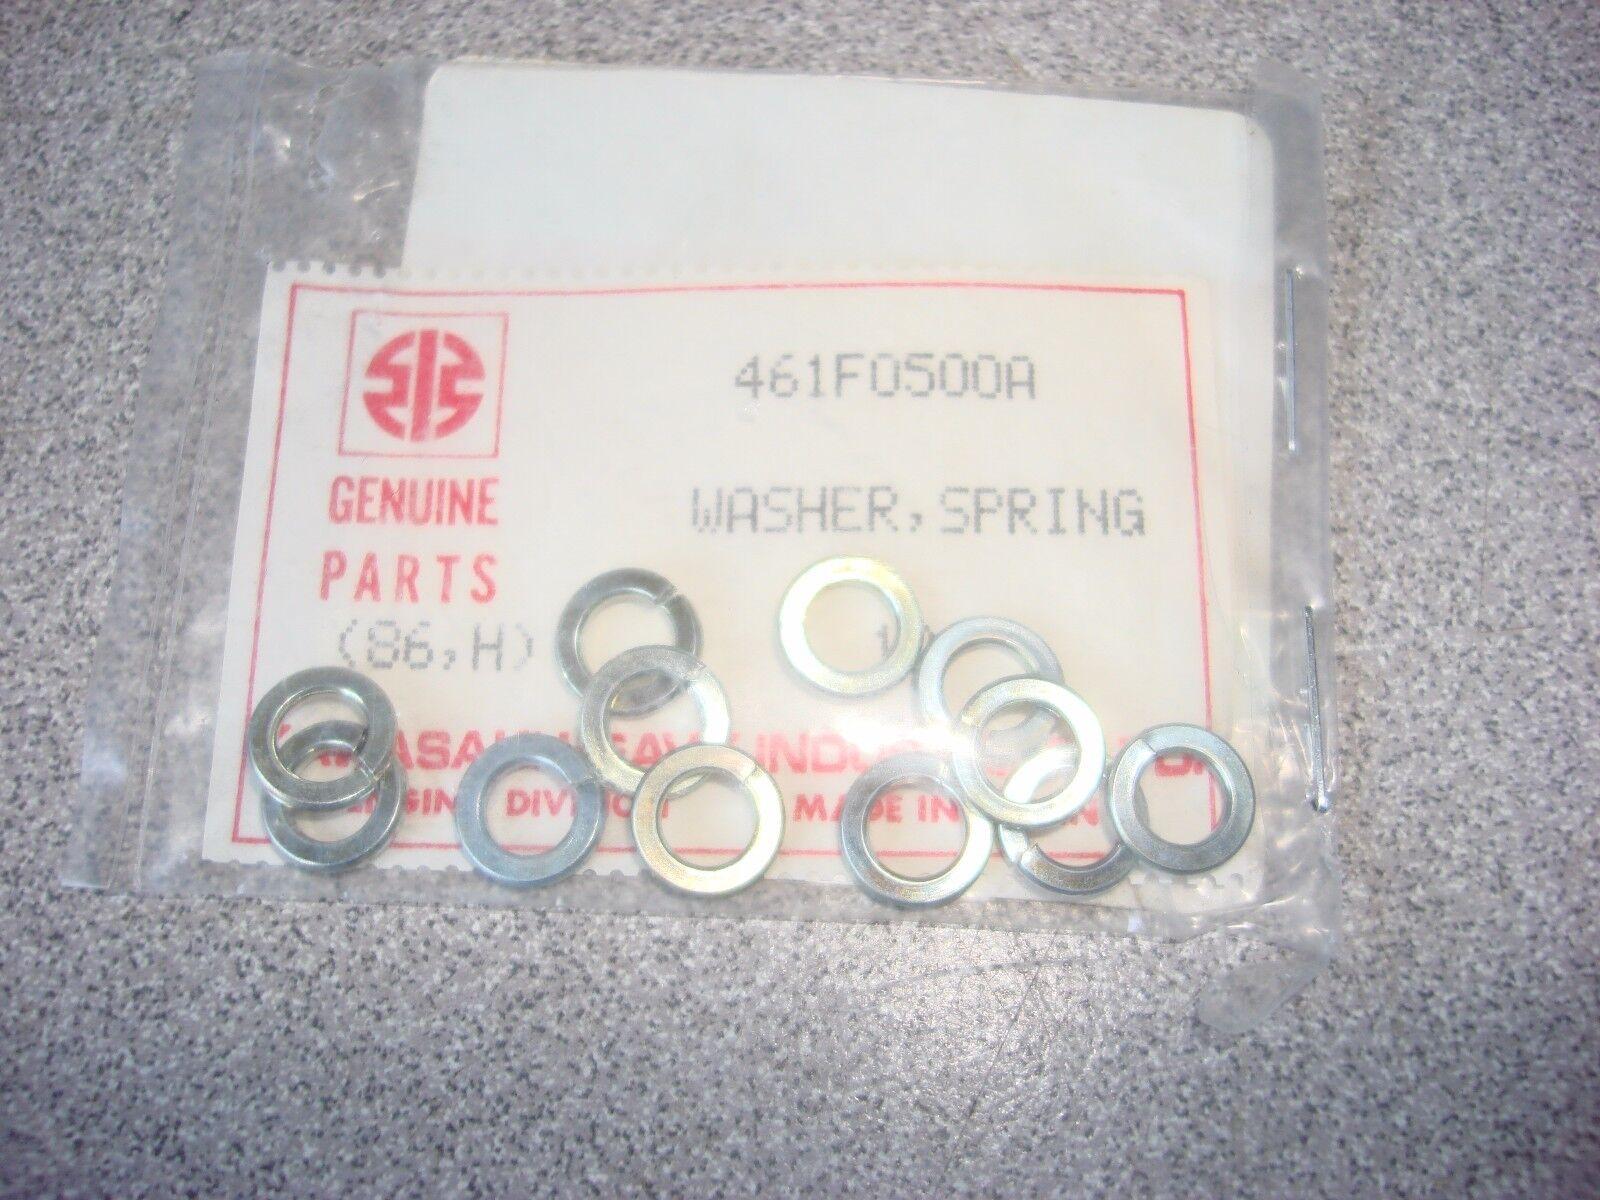 NOS Kawasaki KLX110 KLX450 ZG1400 Ninja ZX1000 ZX1400 Spring Washer 5mm 461F0500